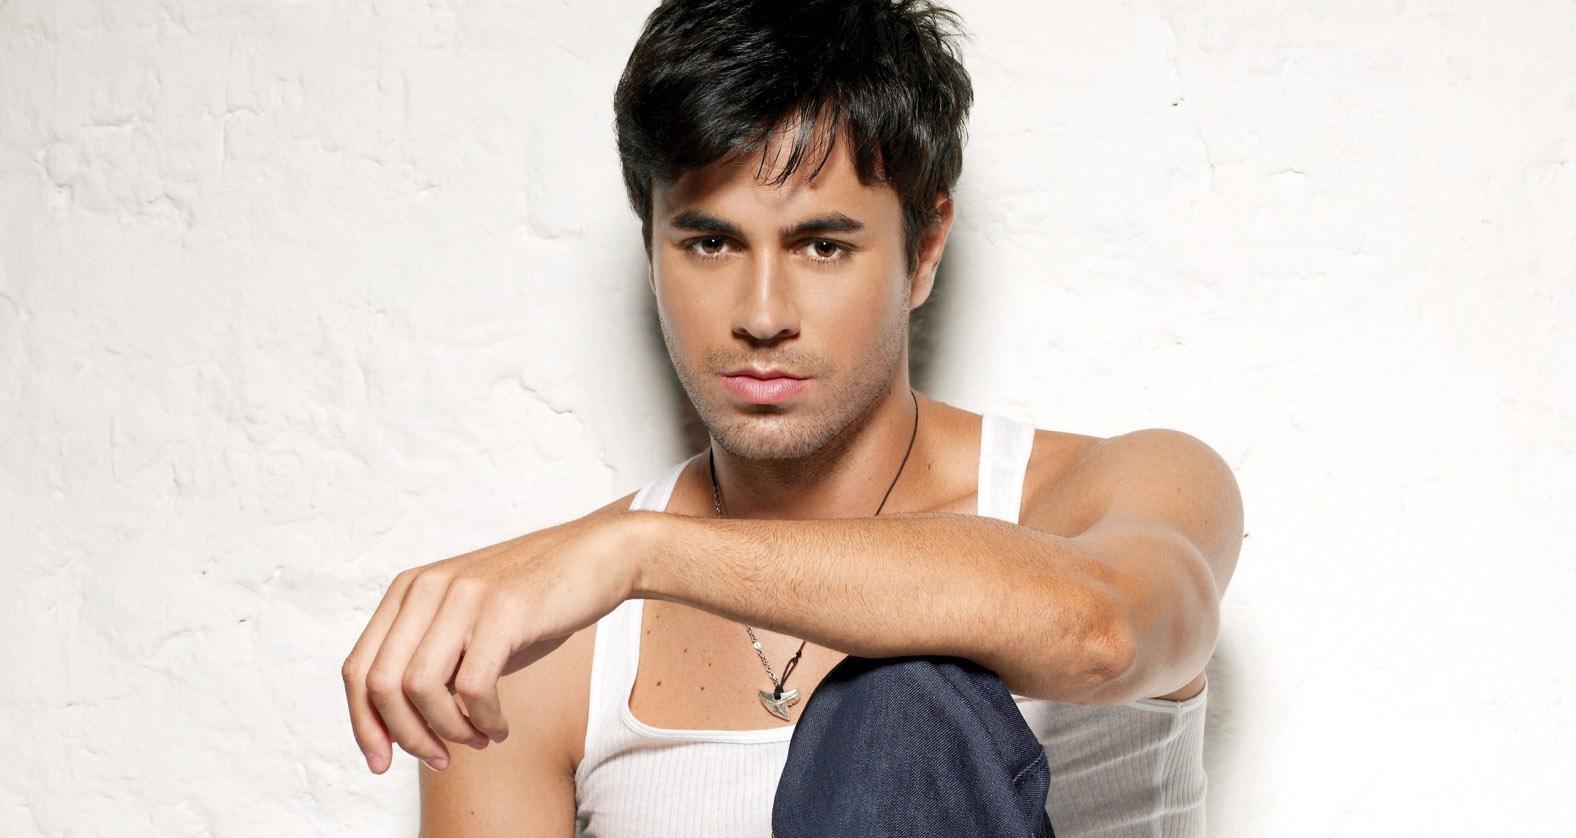 http://1.bp.blogspot.com/-thIPz3Wc-3w/TjRF62yPqBI/AAAAAAAABys/Y4UDDKBetX4/s1600/Enrique-Ayer.jpg